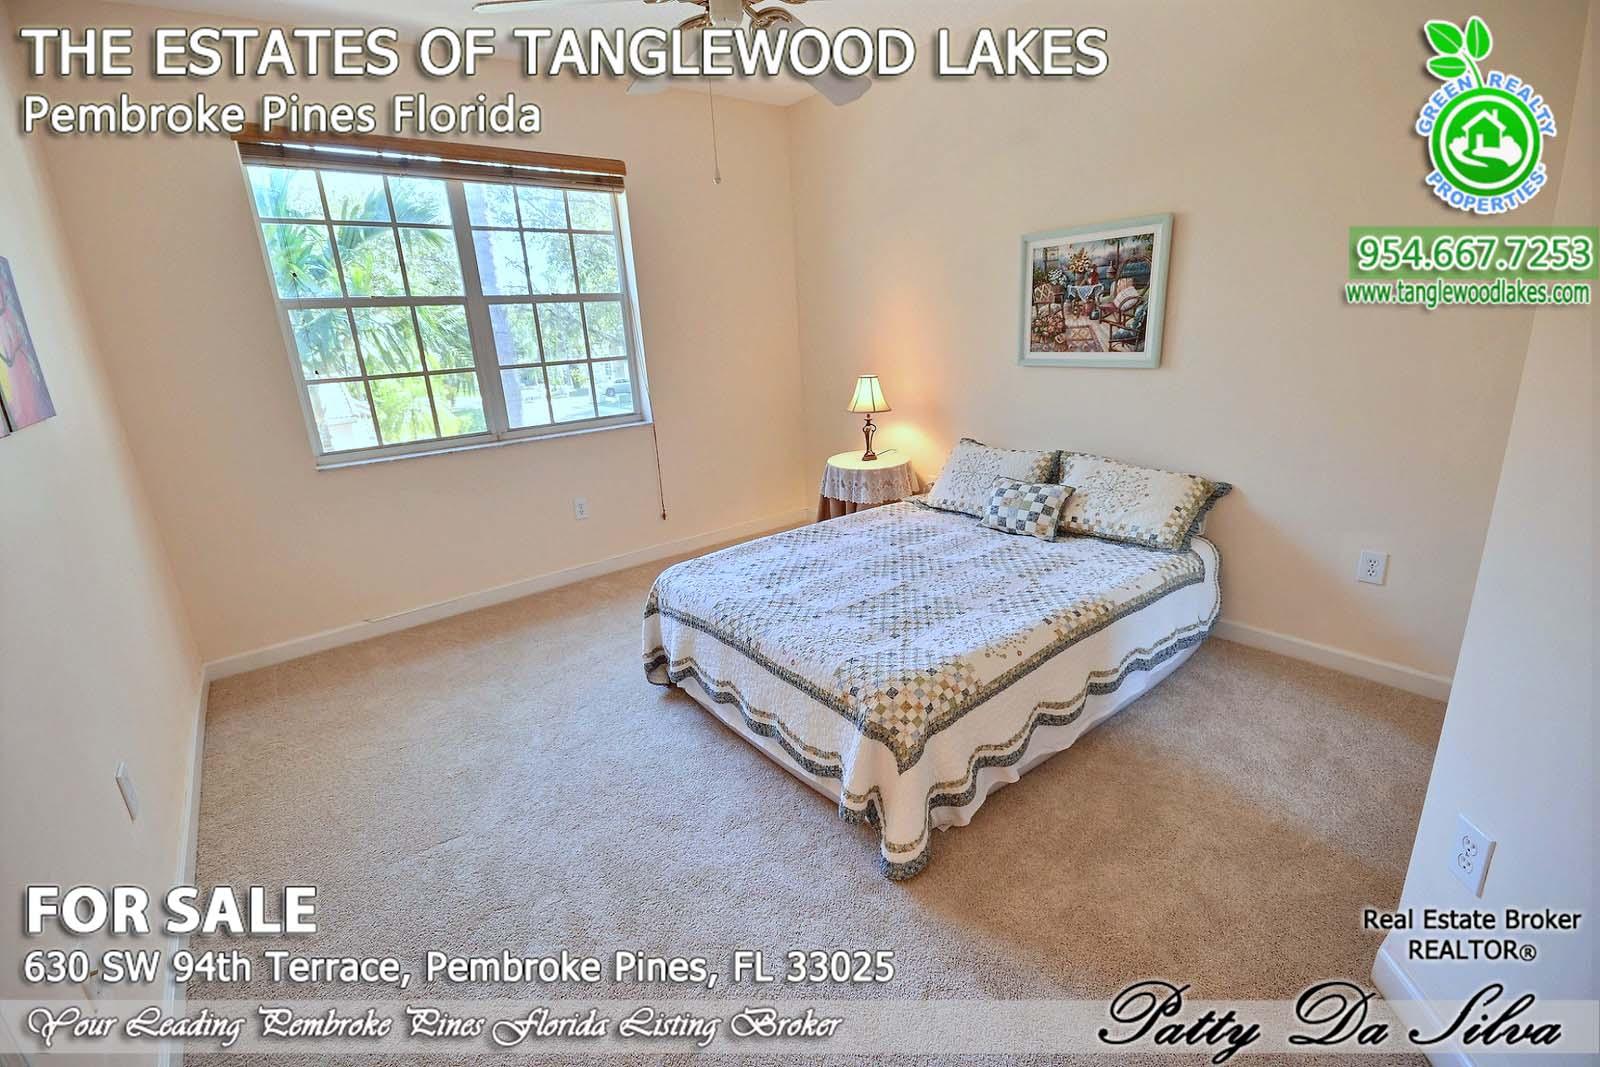 Tanglewood Lakes Realtor Patty Da Silva